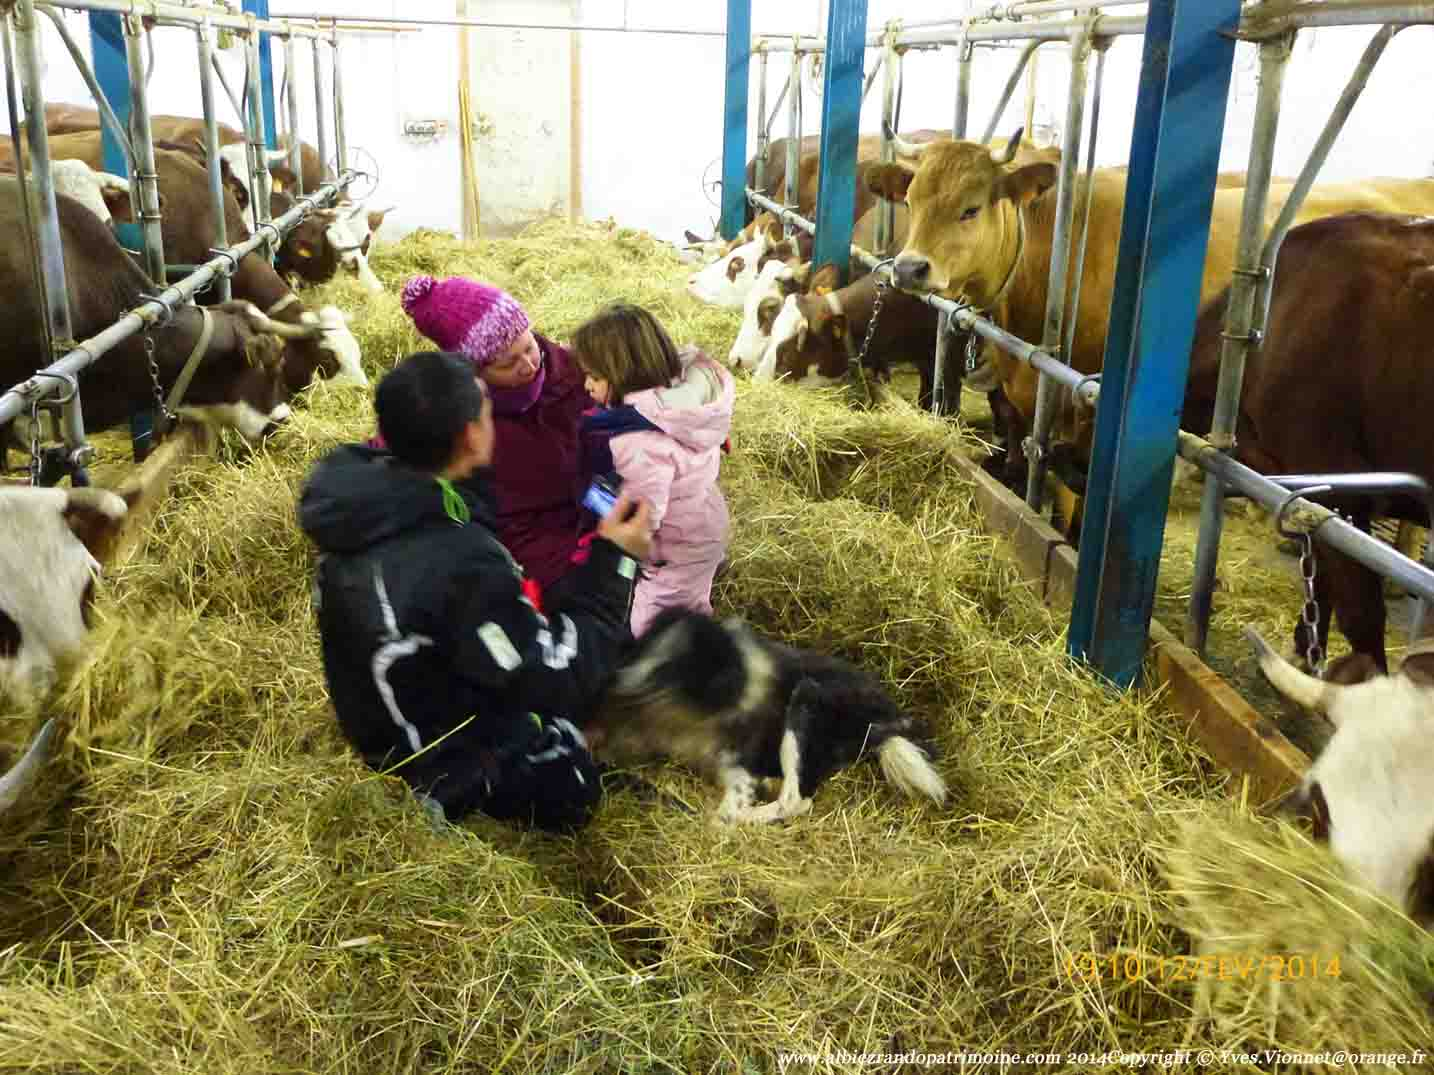 Petite balade gourmande, visite de la traite des vaches